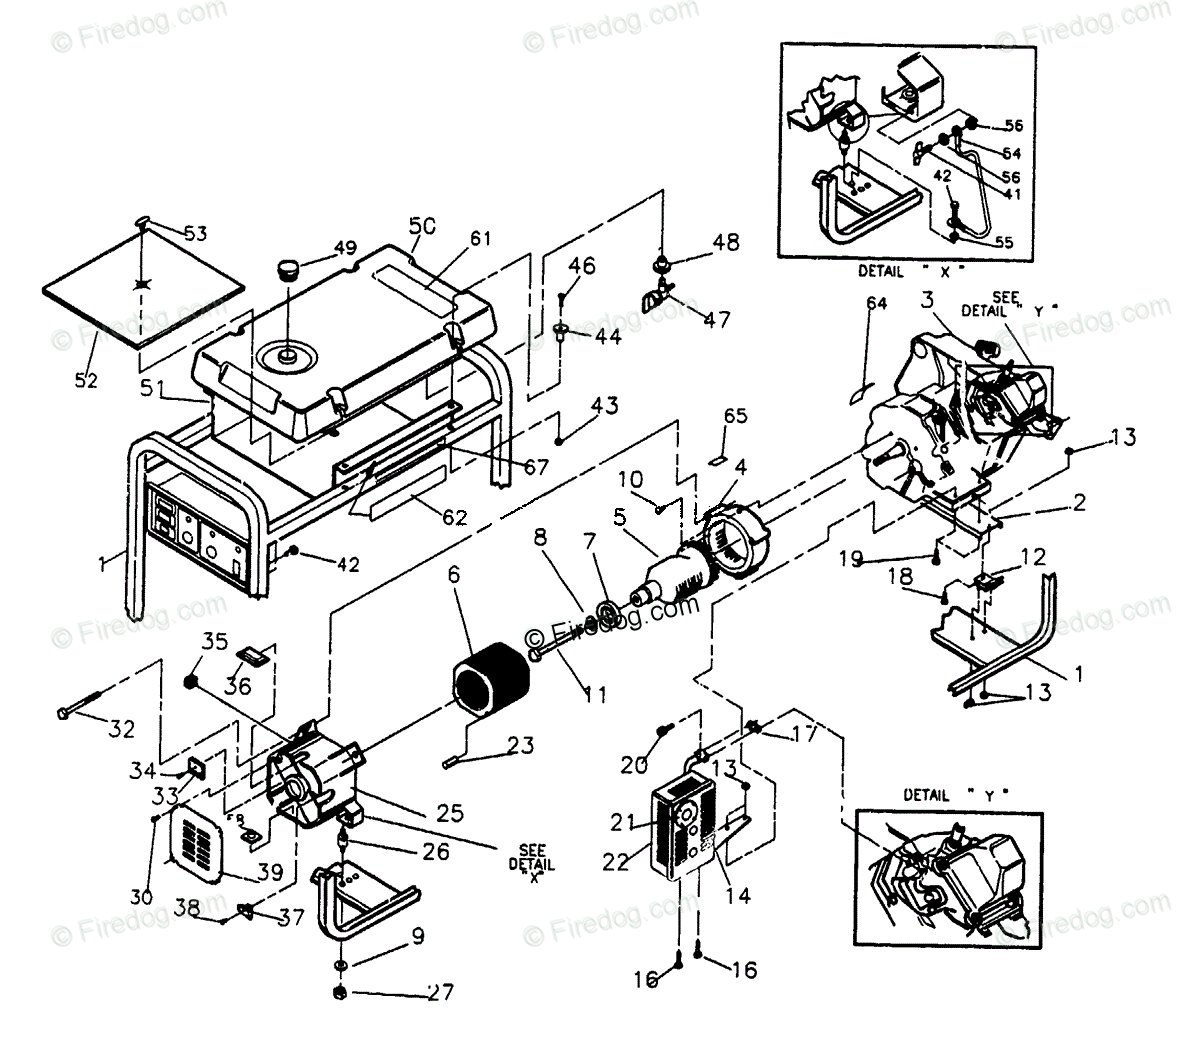 Portable Generator Part Diagram